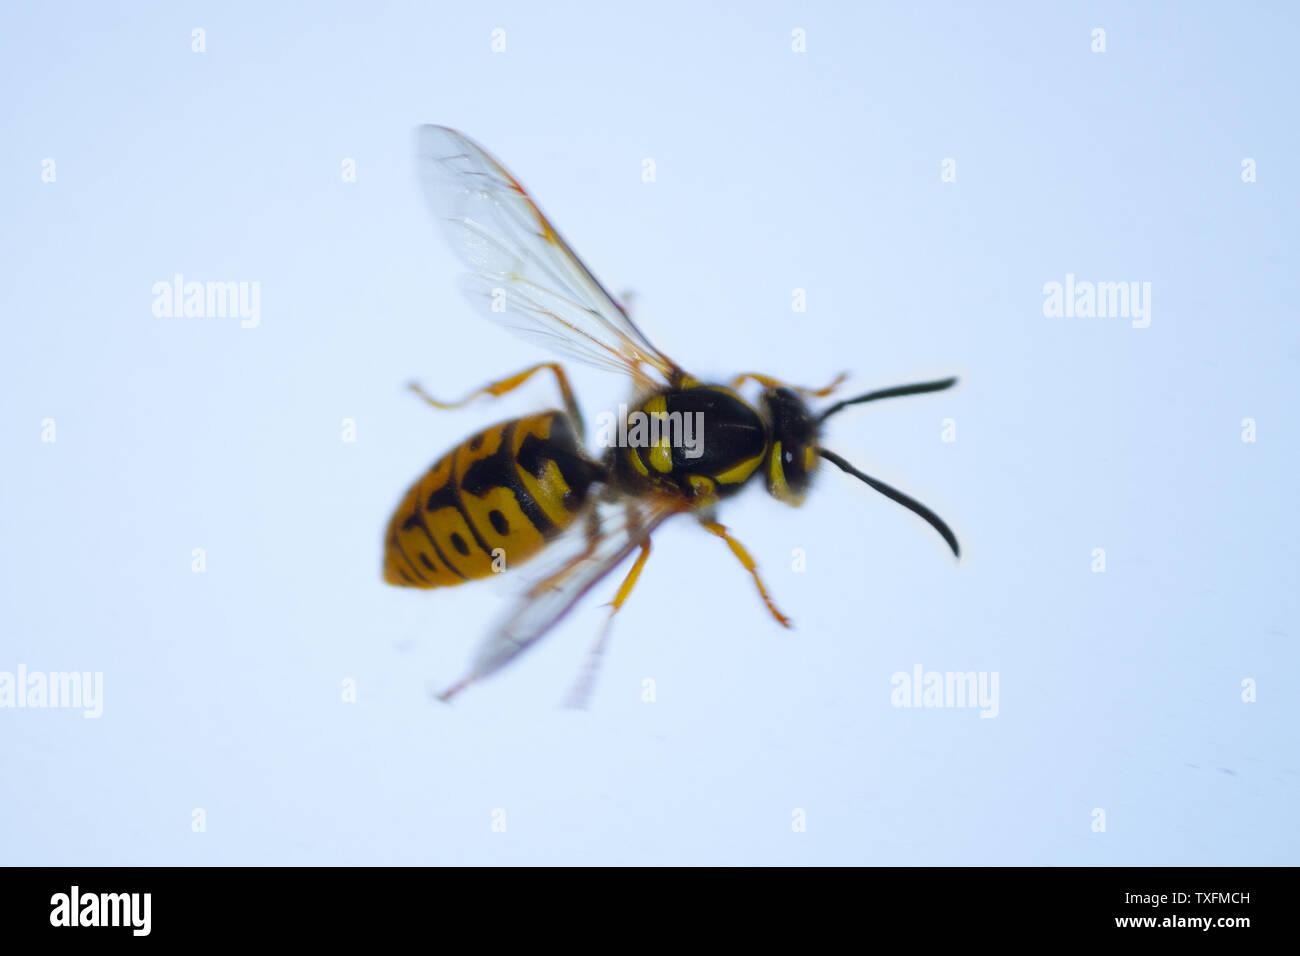 honey bee on the window. close up - Stock Image